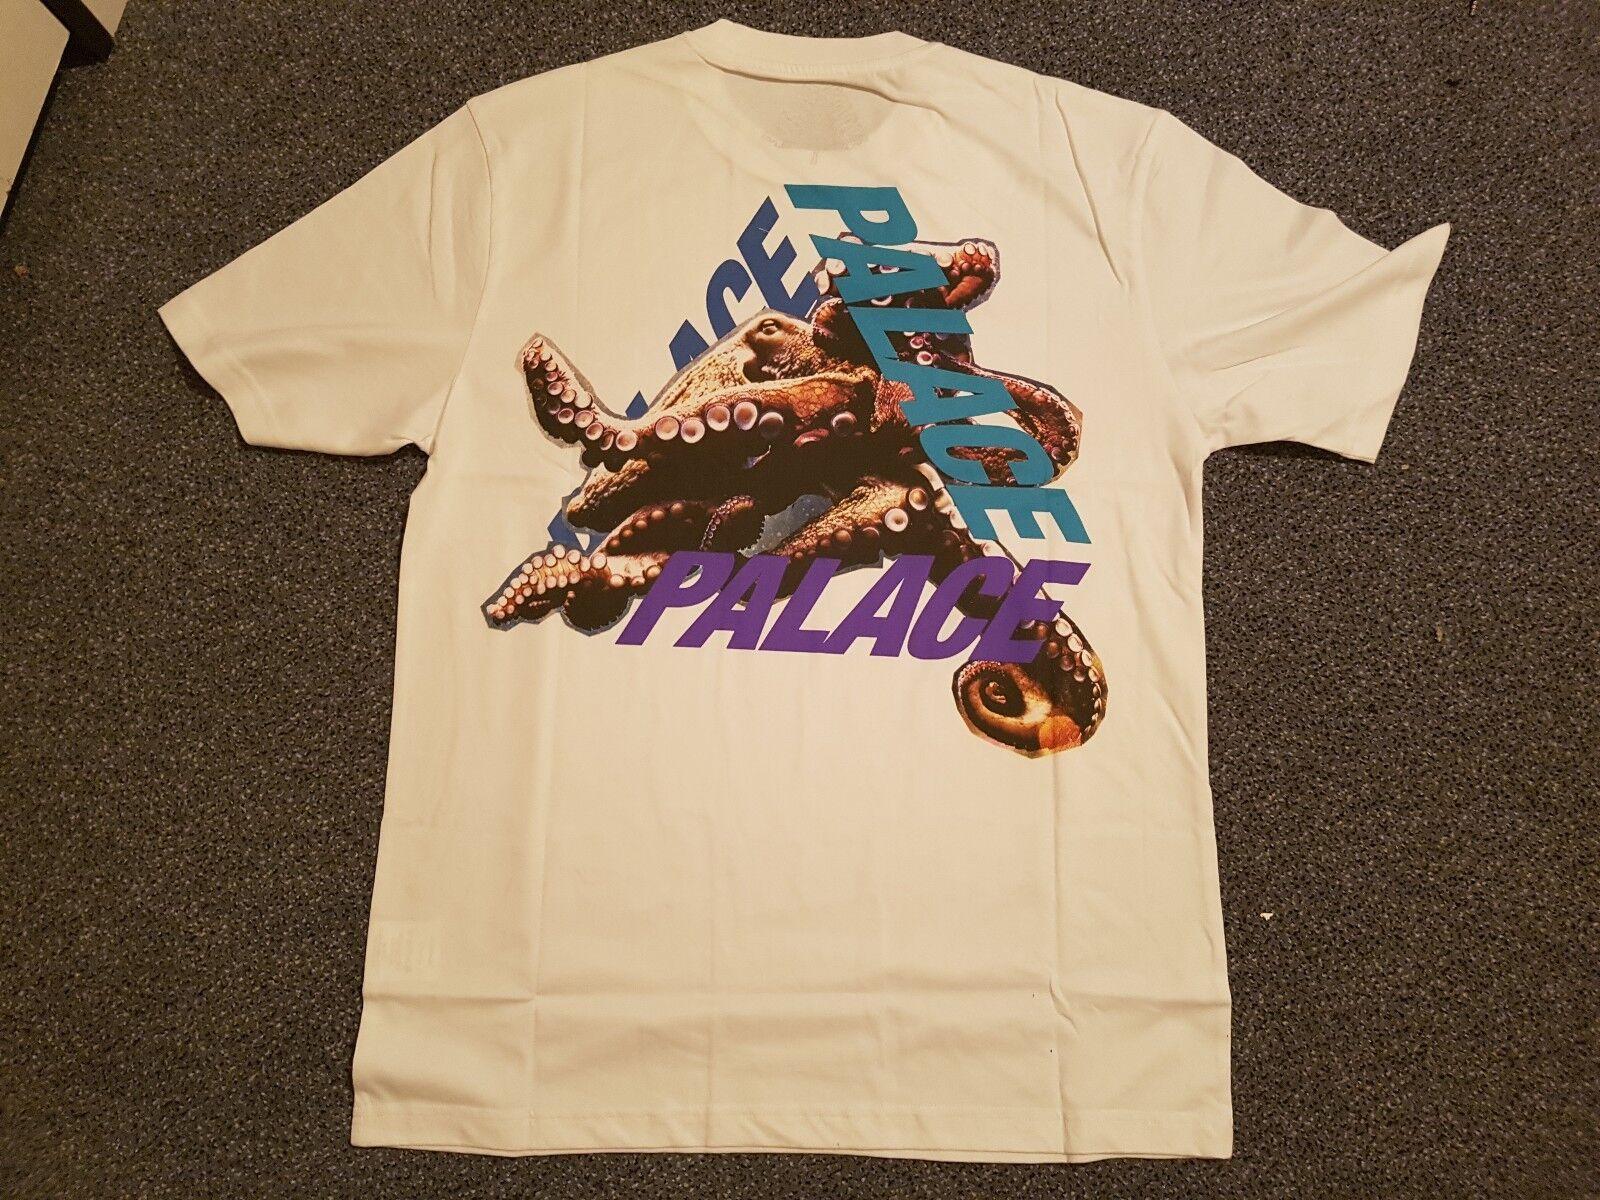 Palace Octo T-Shirt Cherry ROT Rot S M L XL Triferg shirt tee logo Supreme NEW